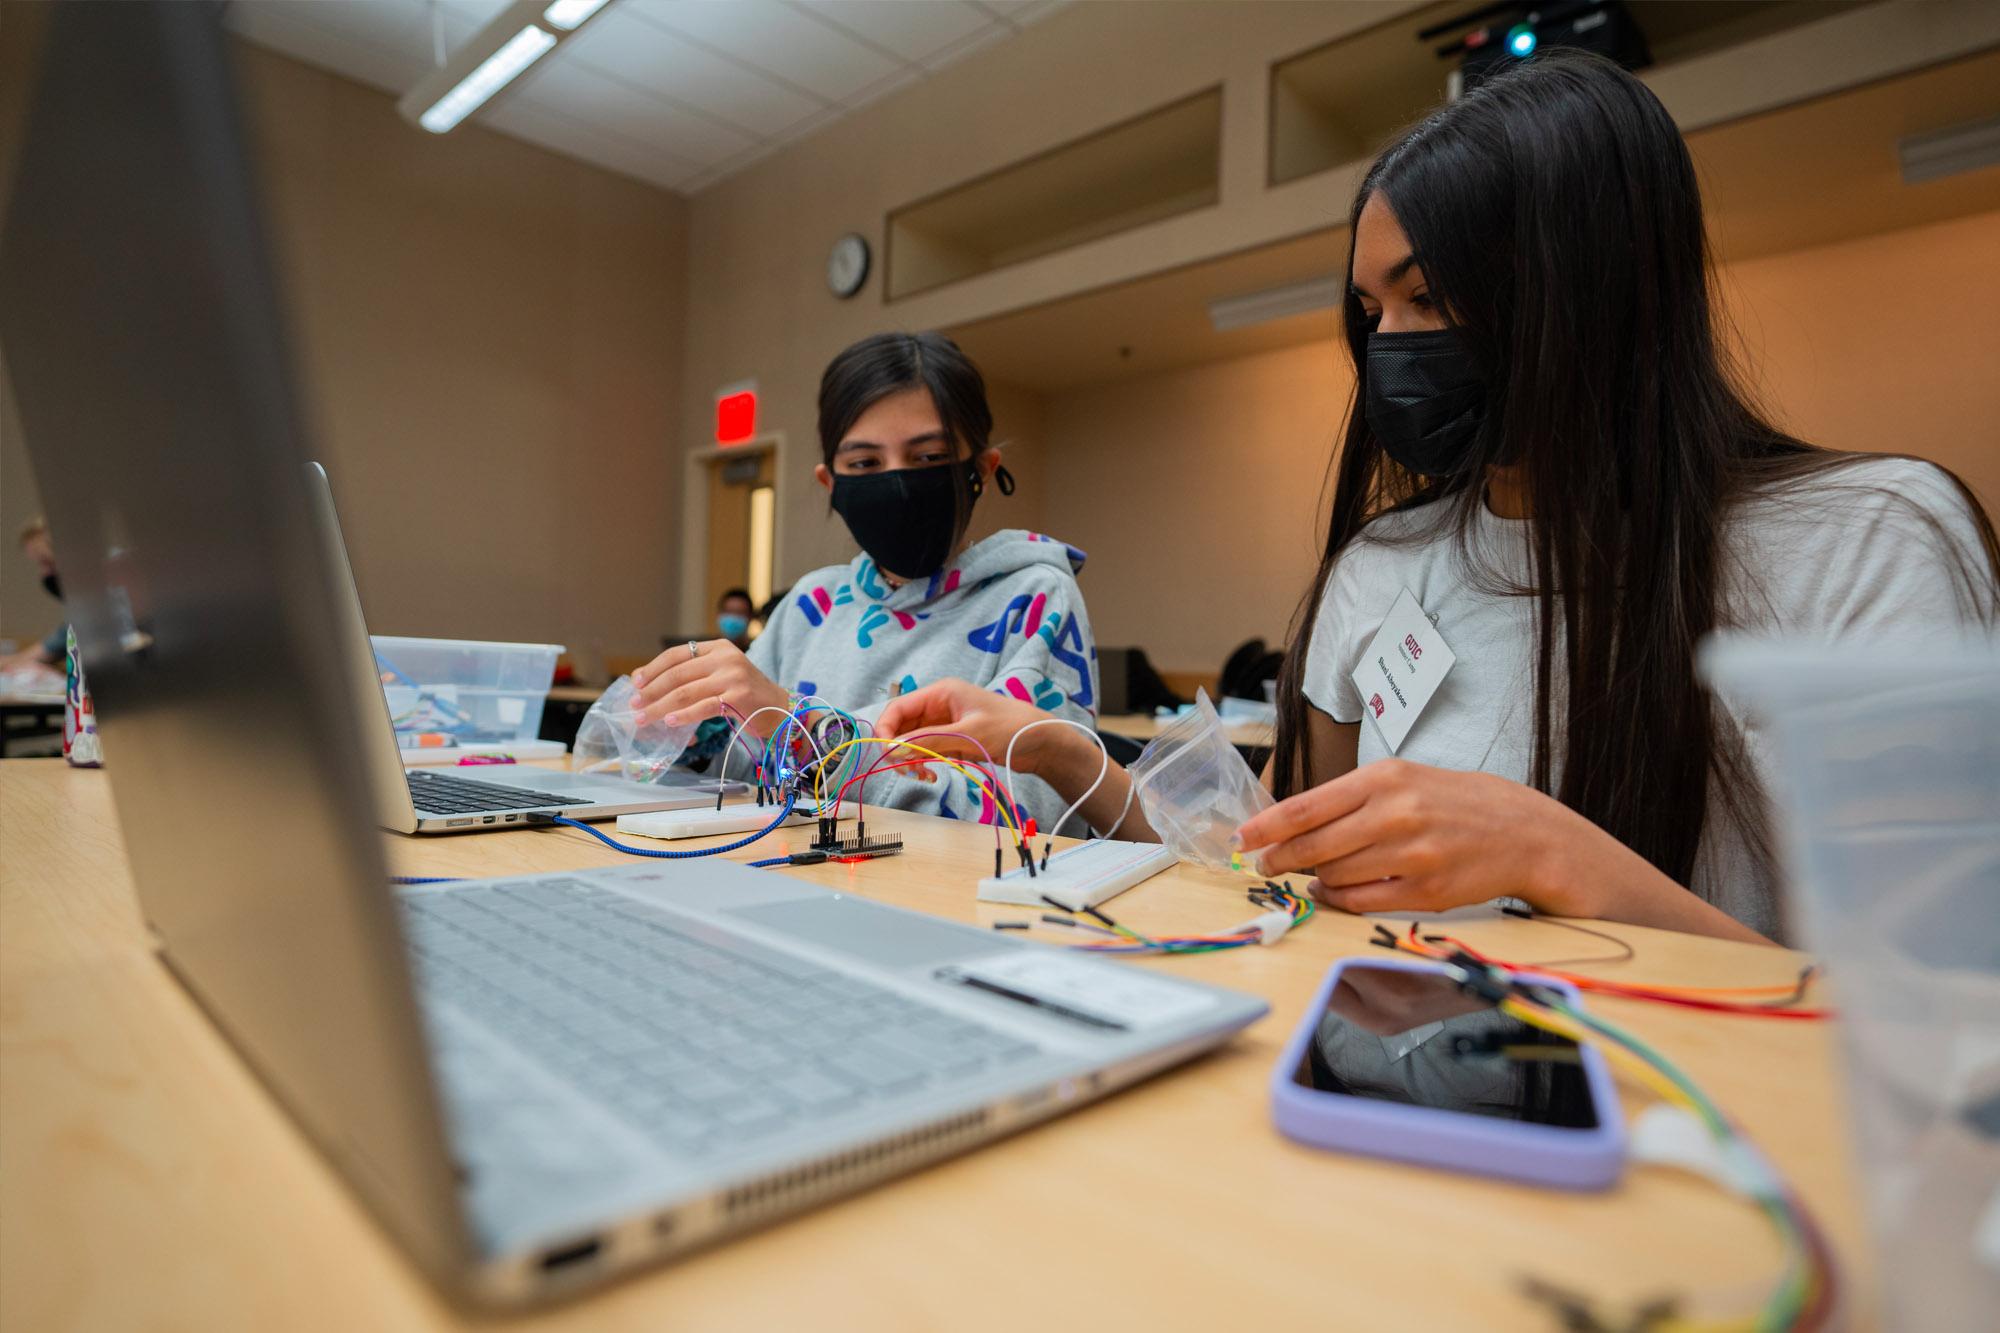 Girls working on electronics